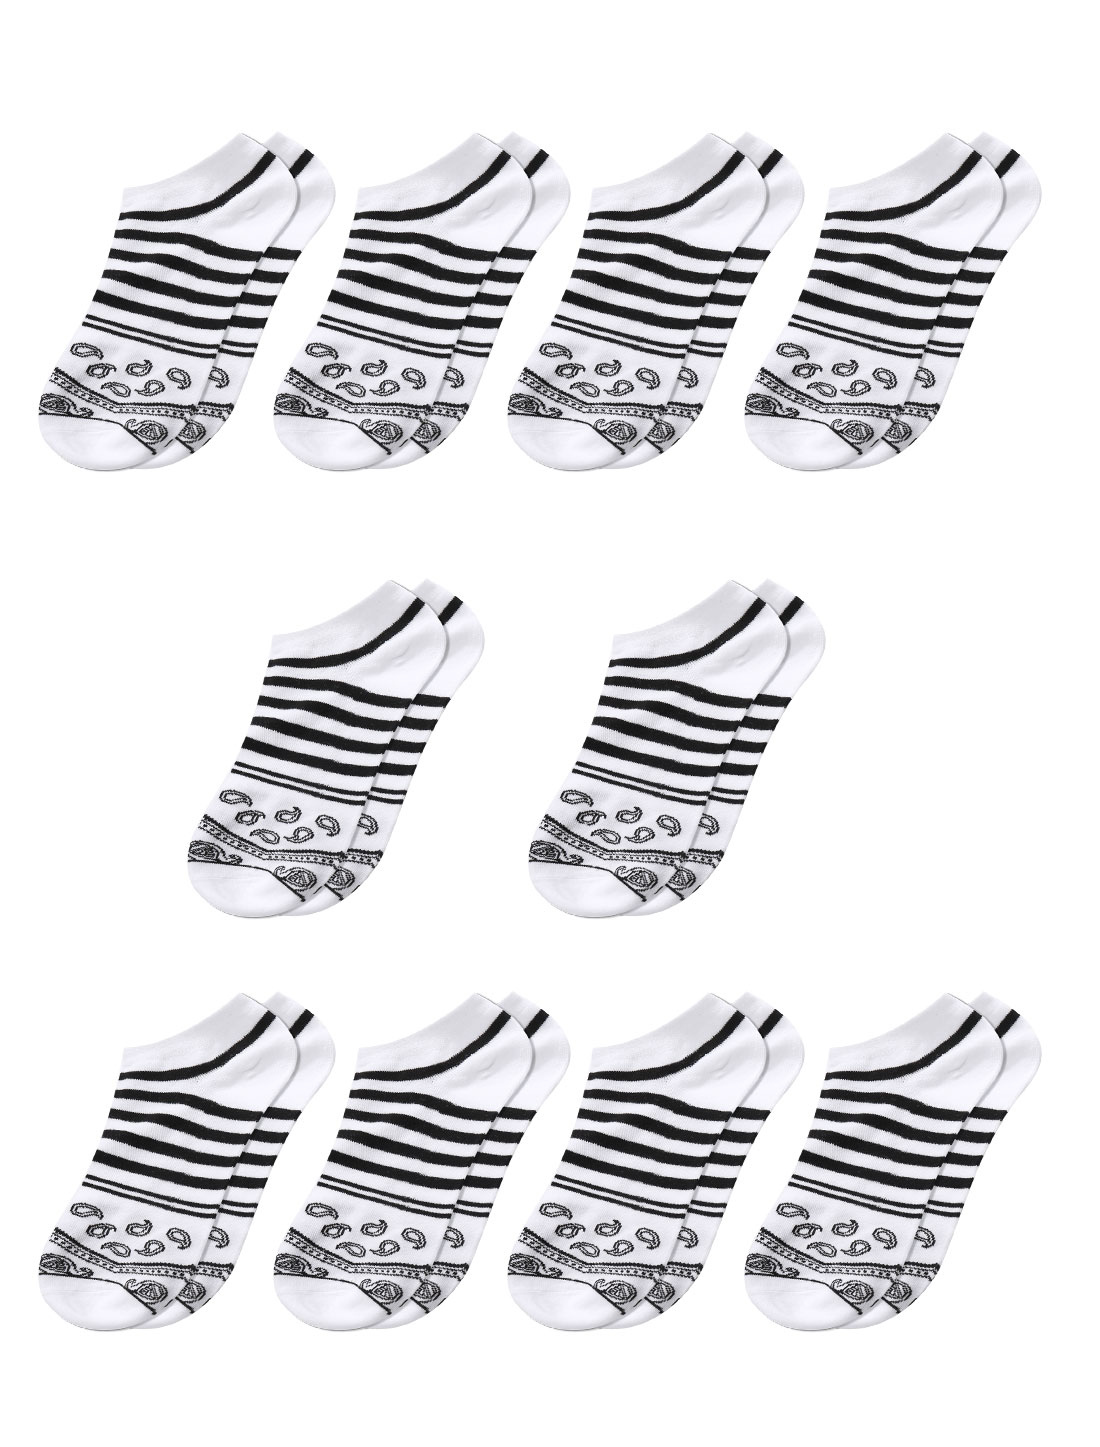 Men Stripes Paisleys Pattern Low Cut Short Socks 10 Pairs White M